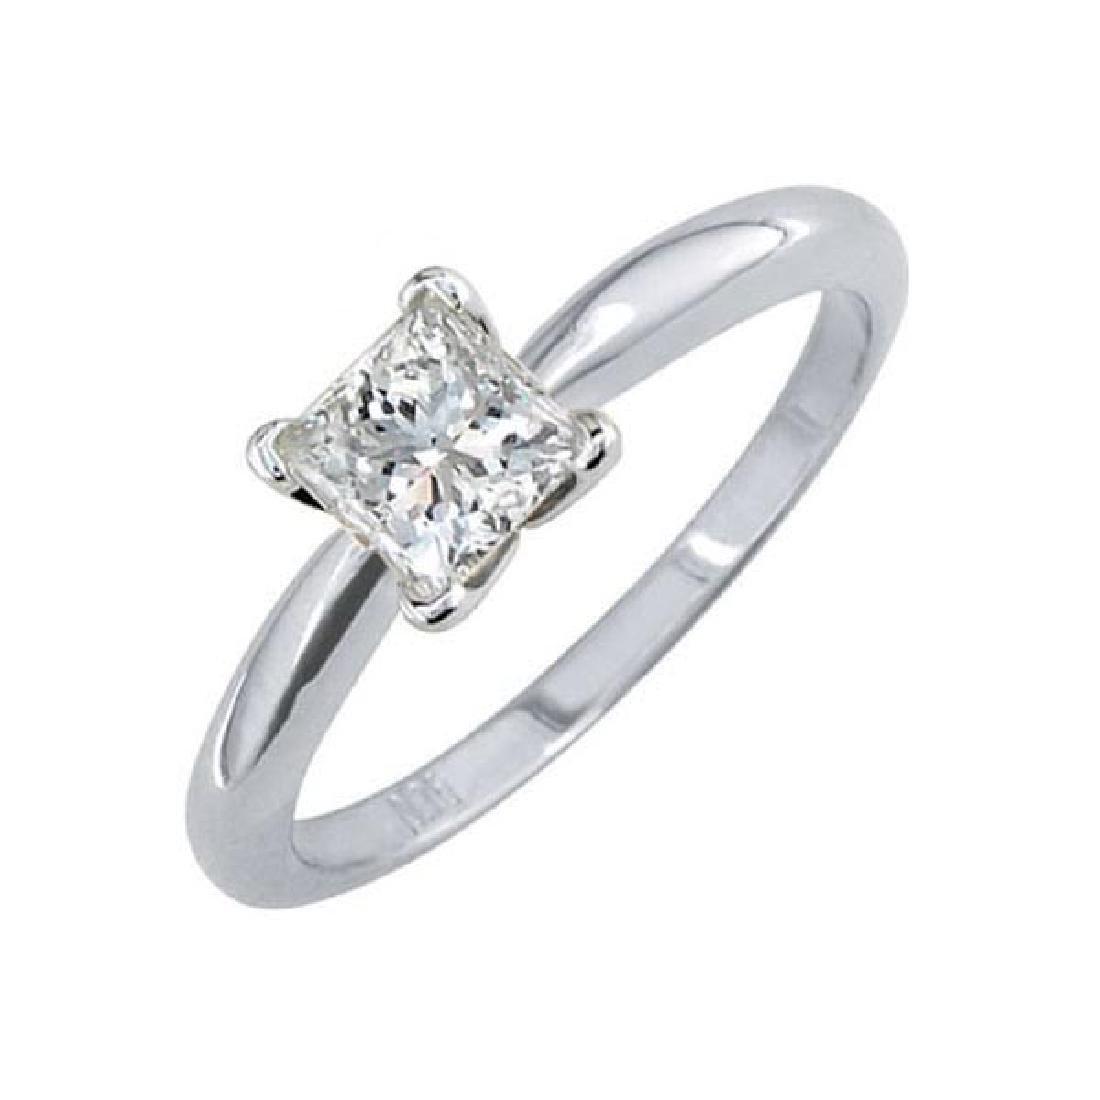 Certified 1.07 CTW Princess Diamond Solitaire 14k Ring